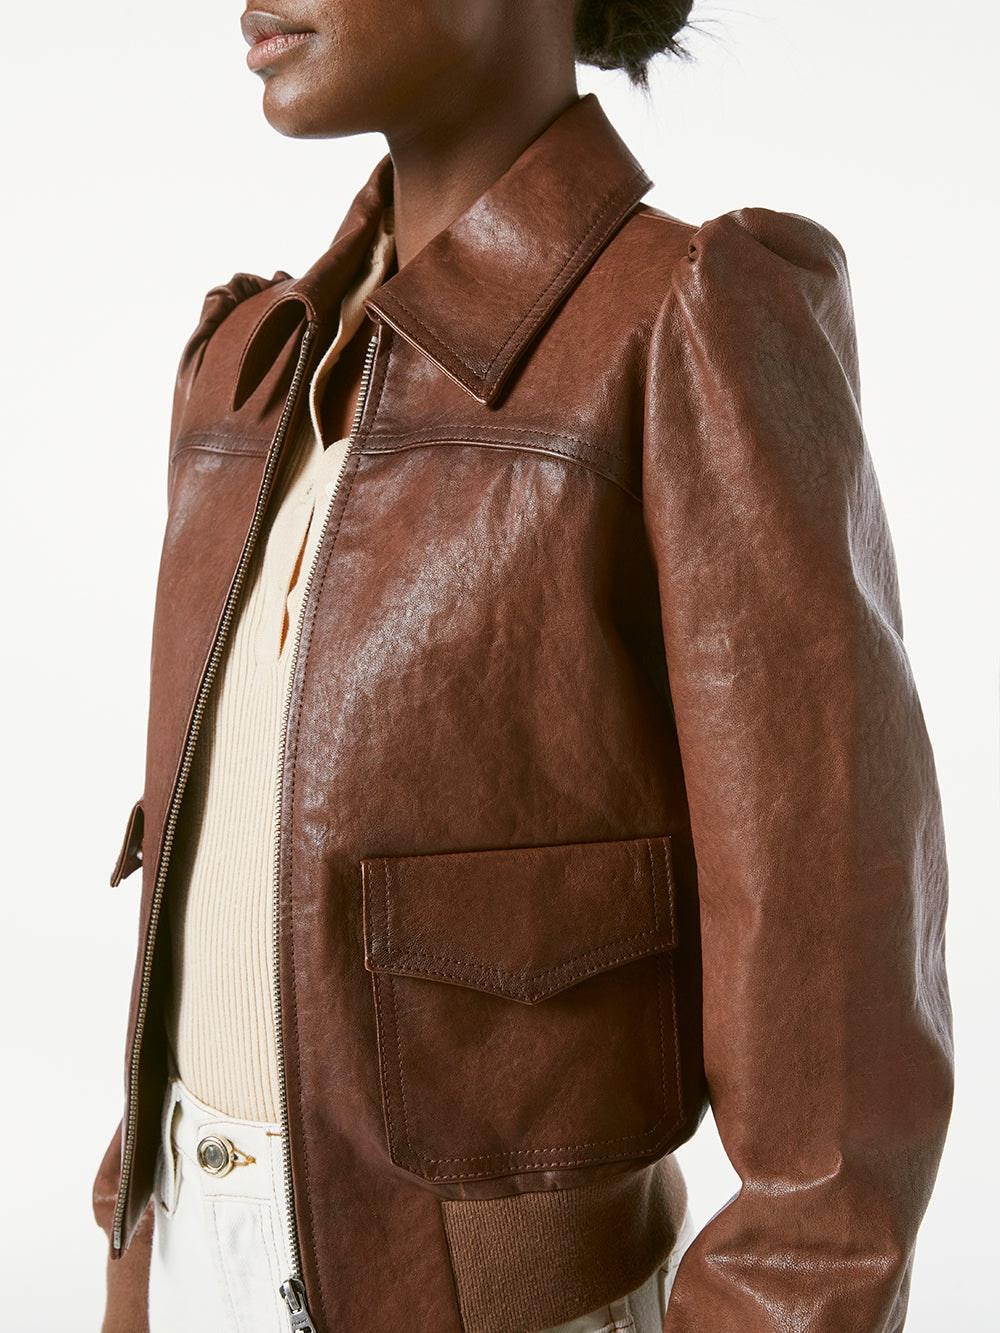 jacket detail view